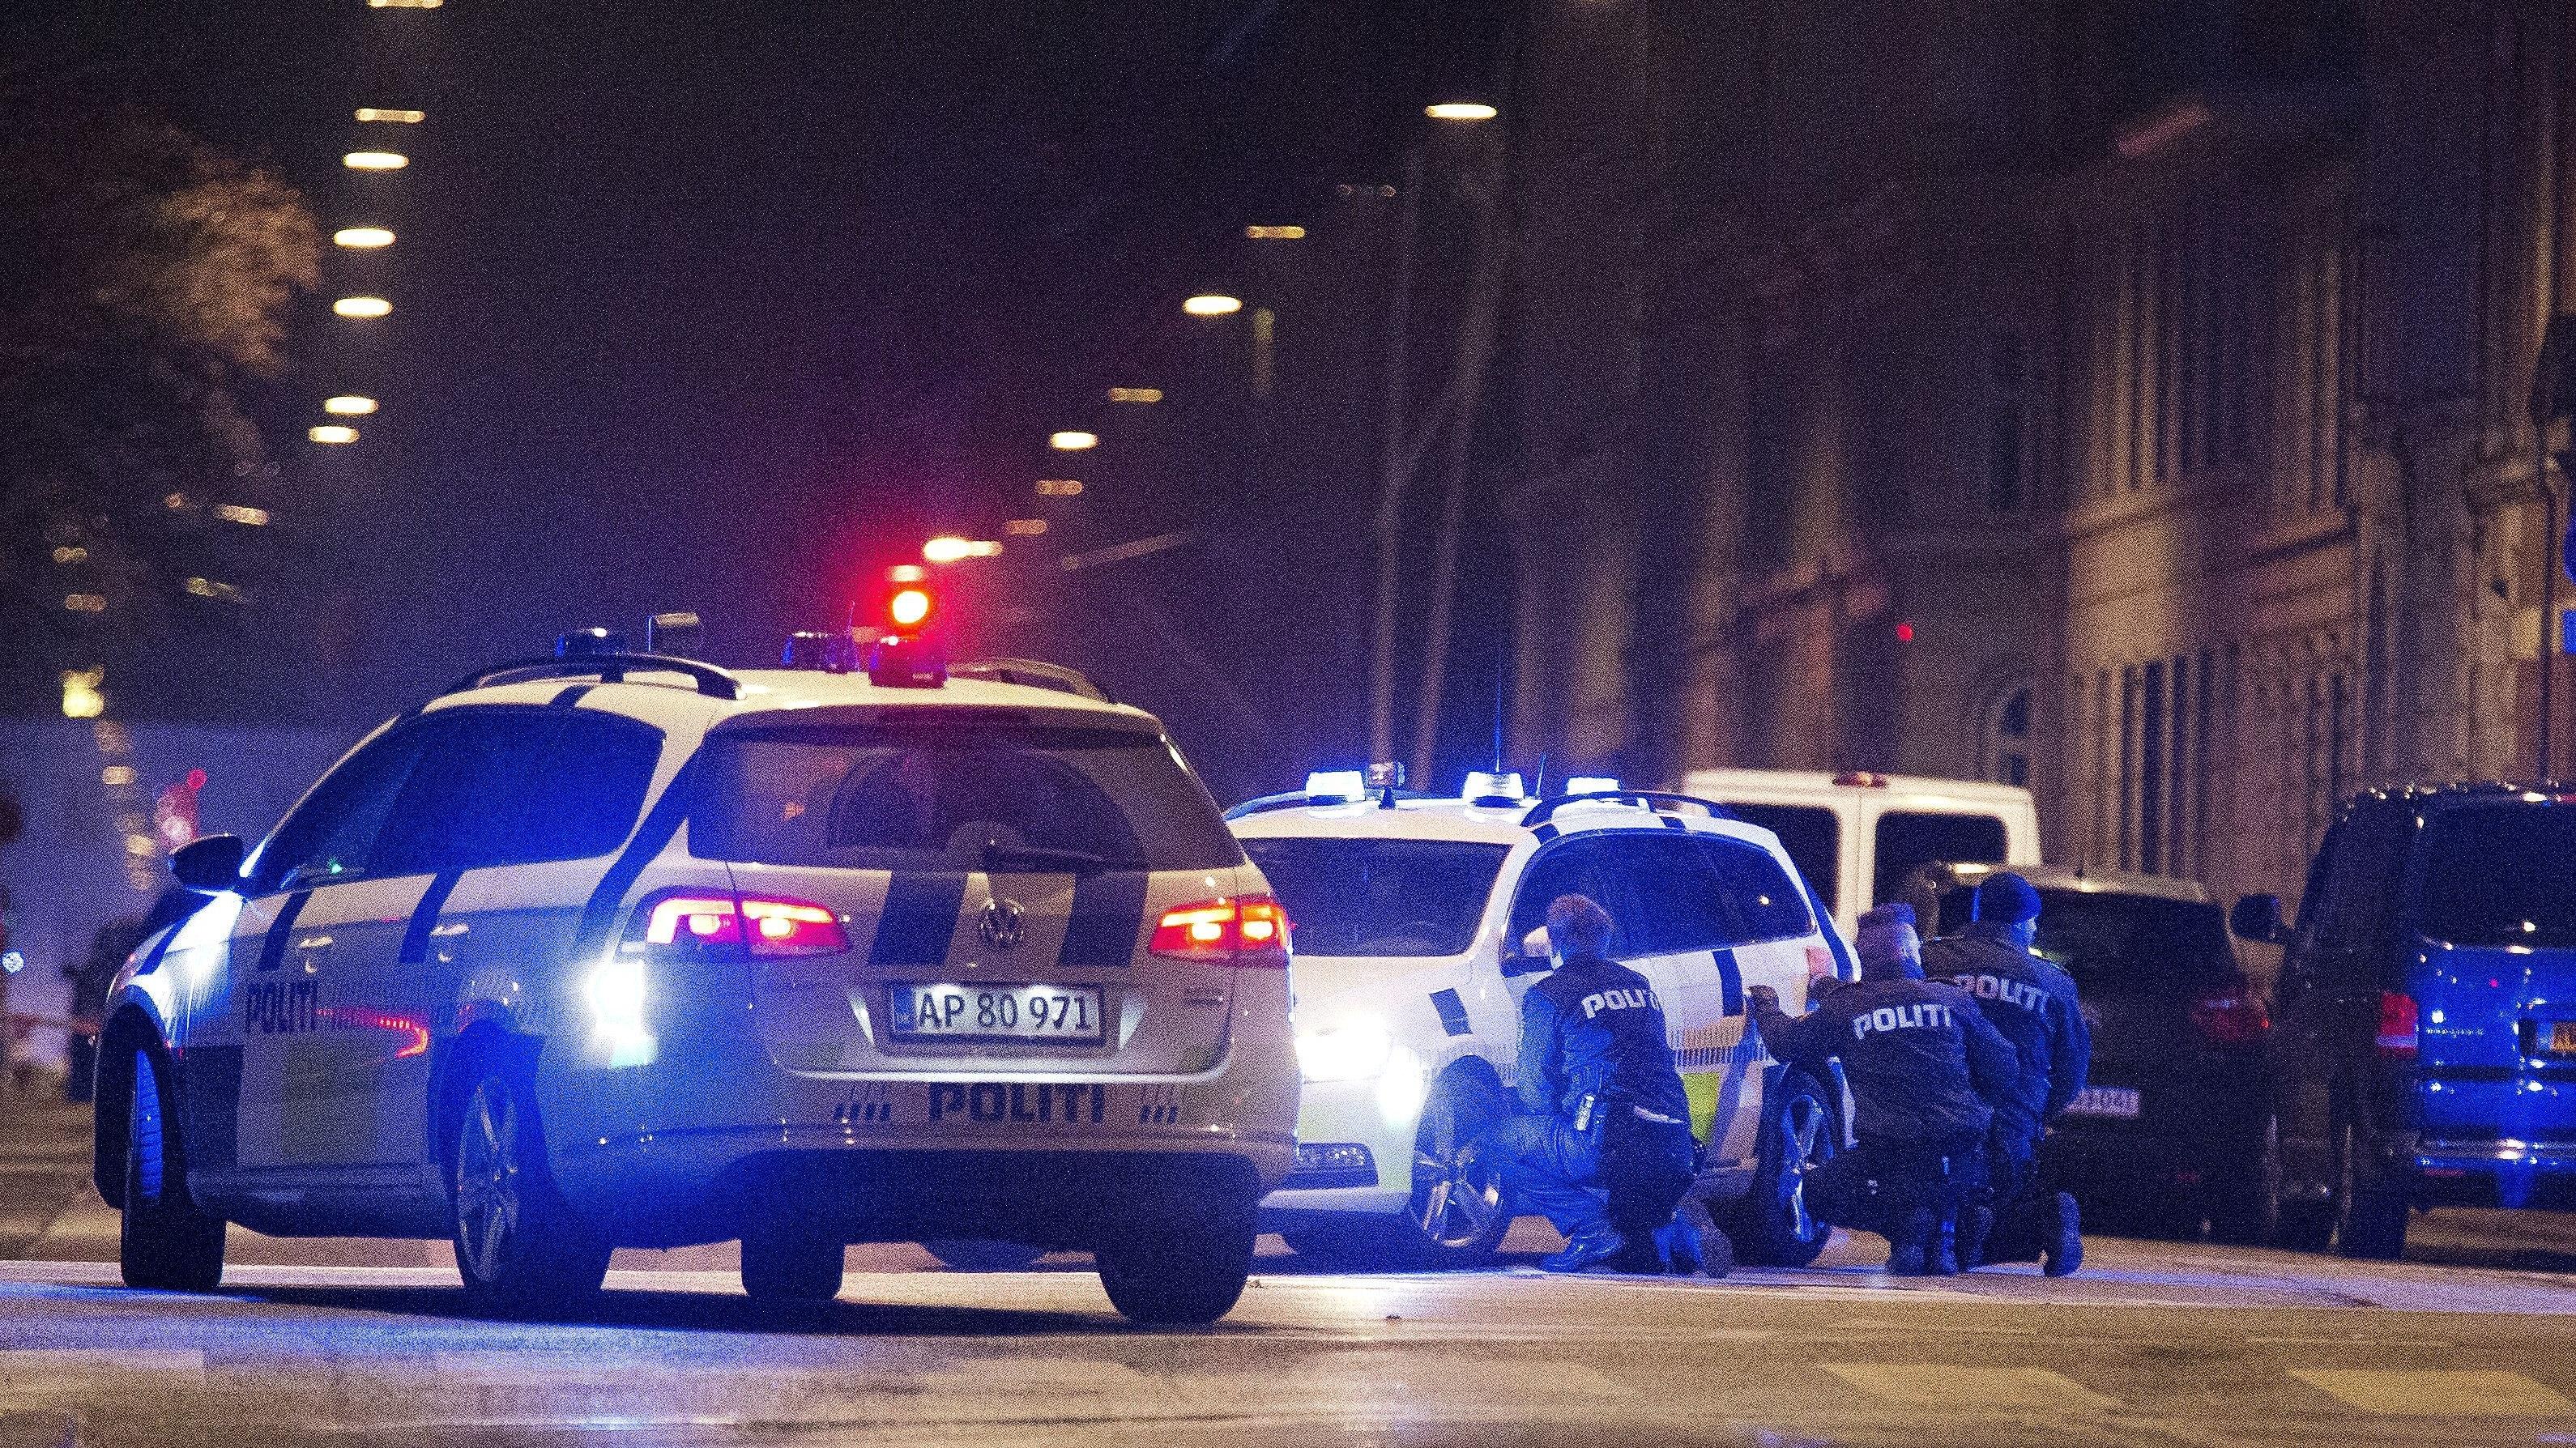 Suspect In Copenhagen Attacks Killed, Police Say